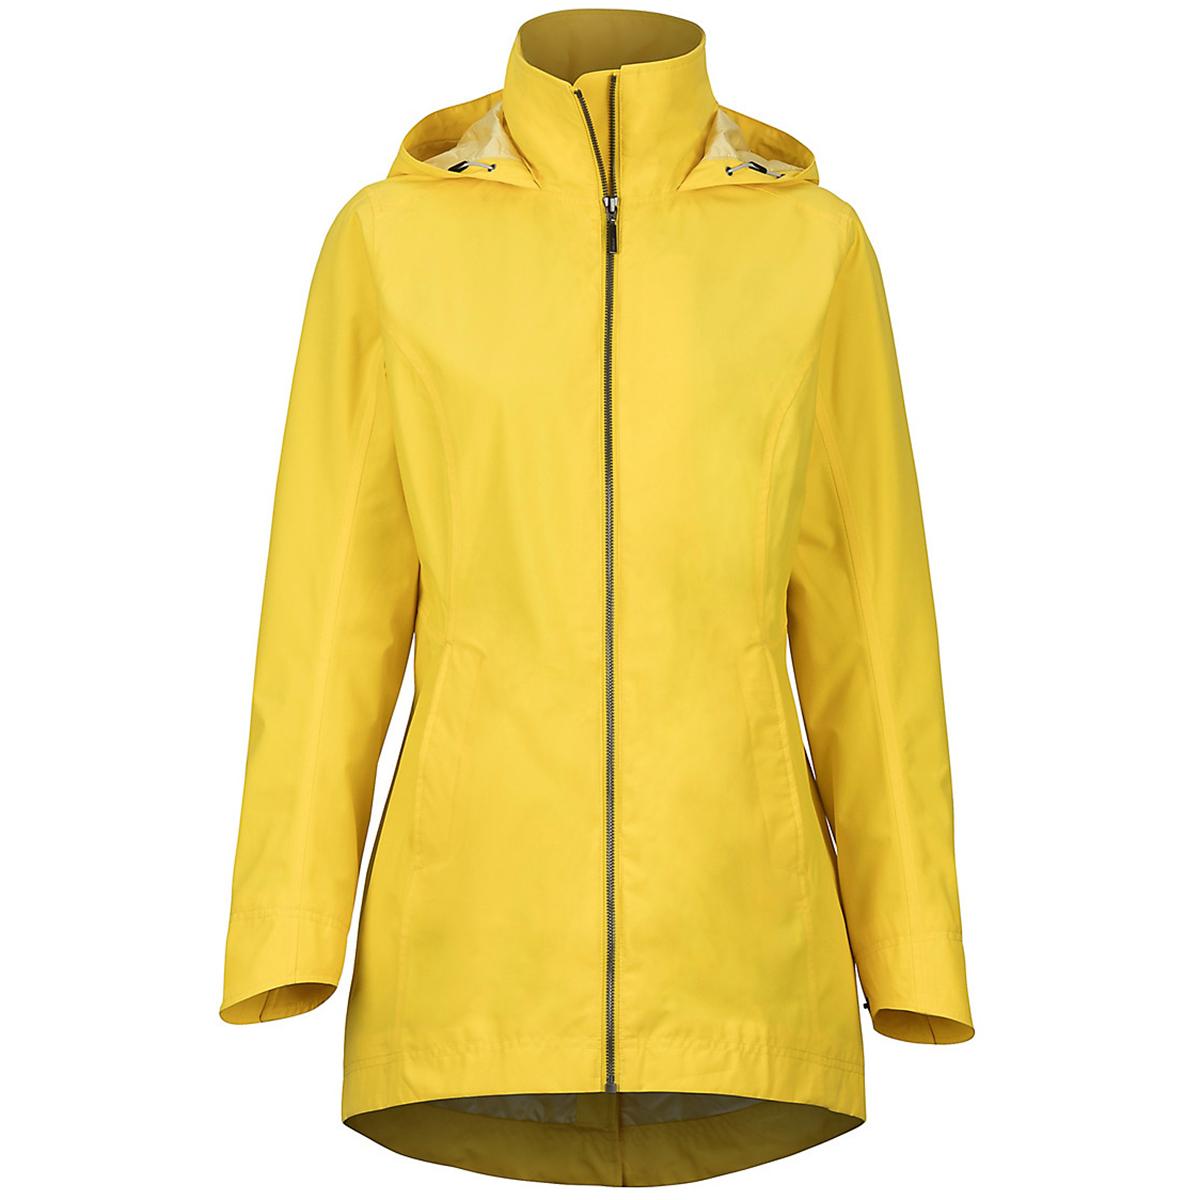 Marmot Women's Lea Jacket - Yellow, S